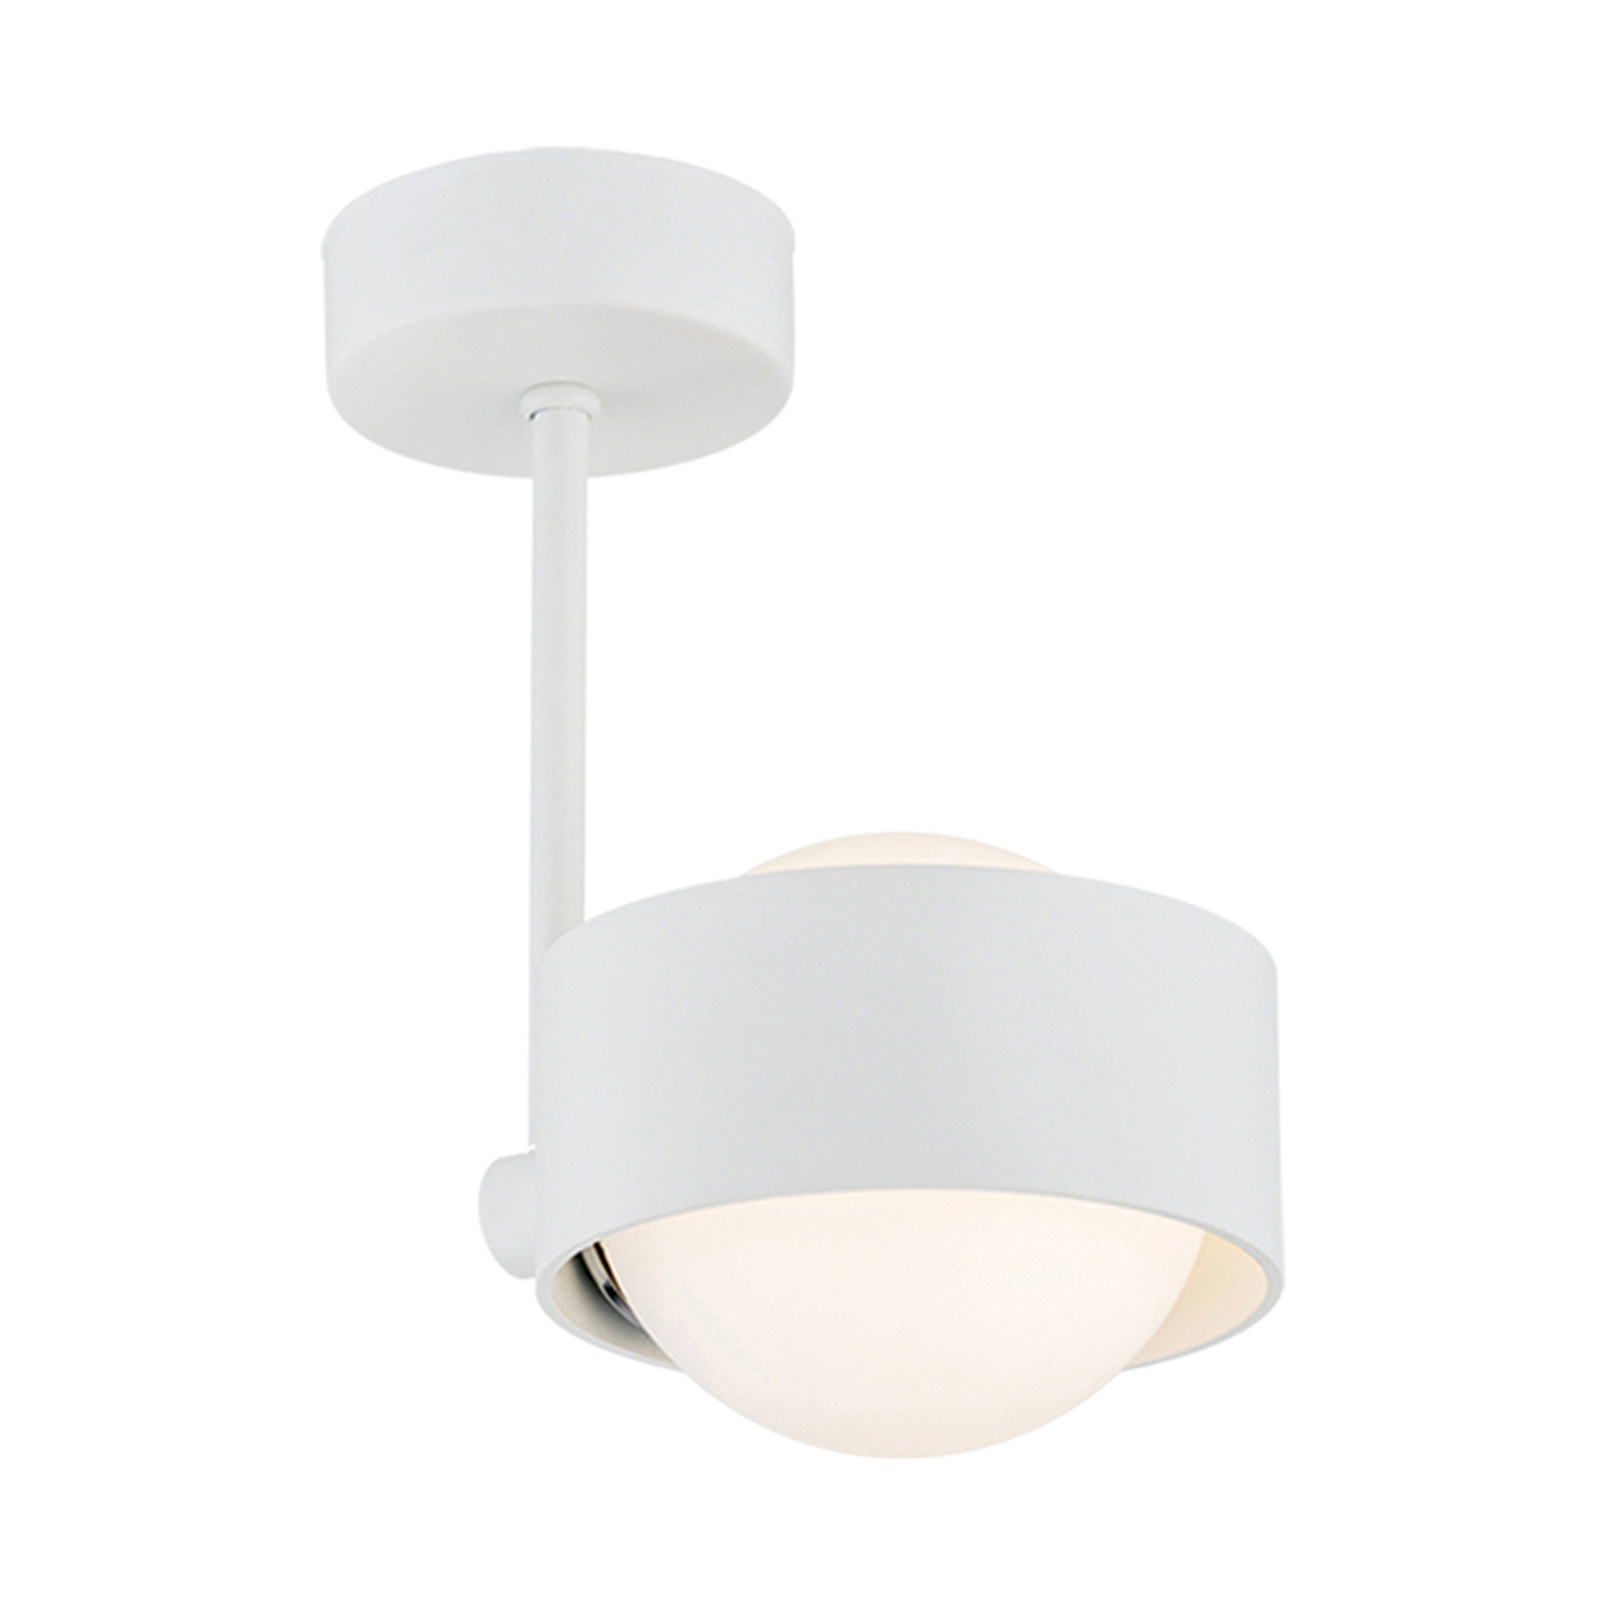 LED-badrumstaklampa Macedo, 1 lampa, vit